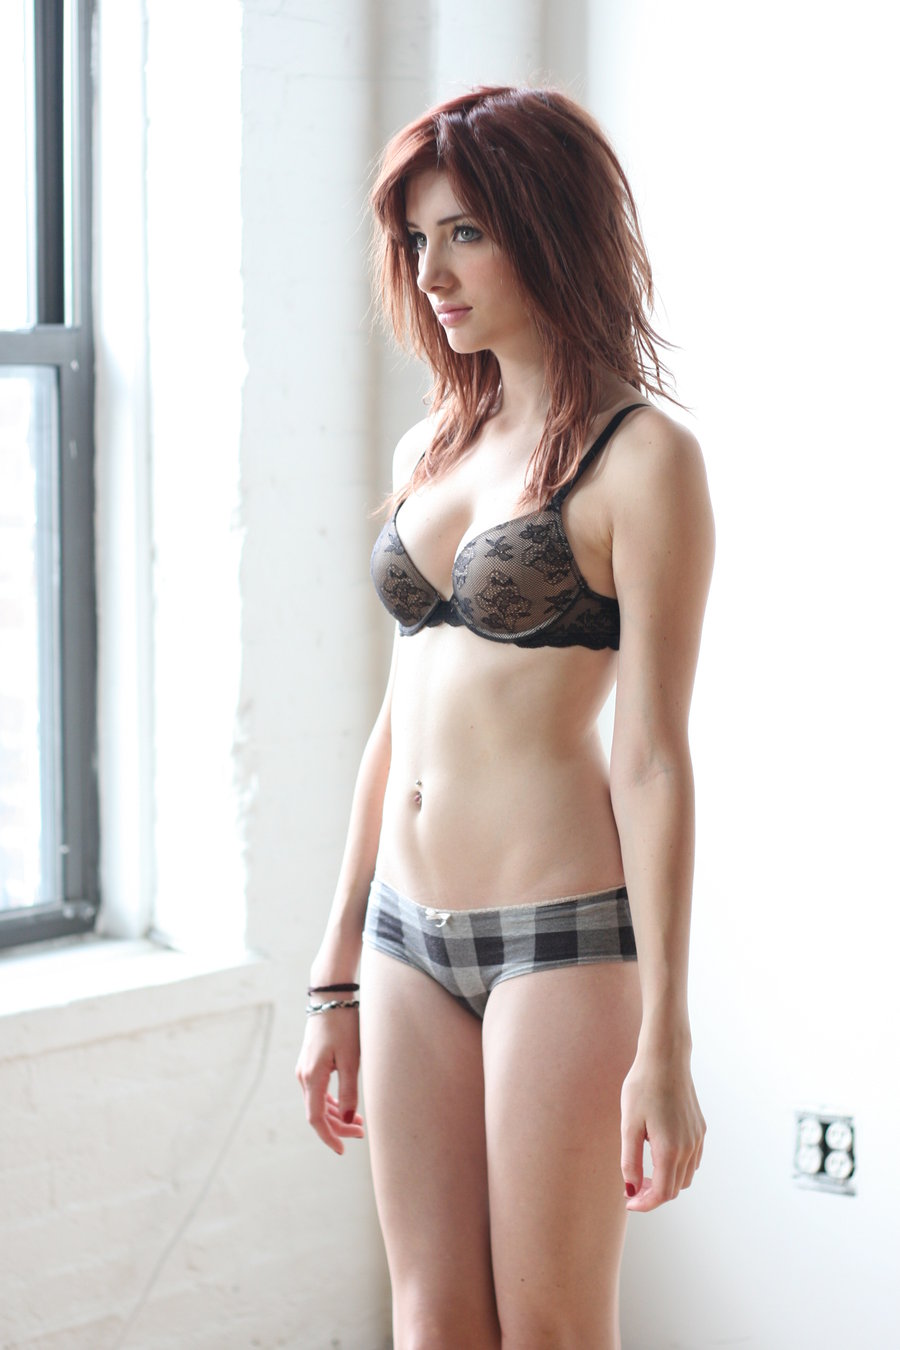 Denise milani all sexy bikini non nude 5